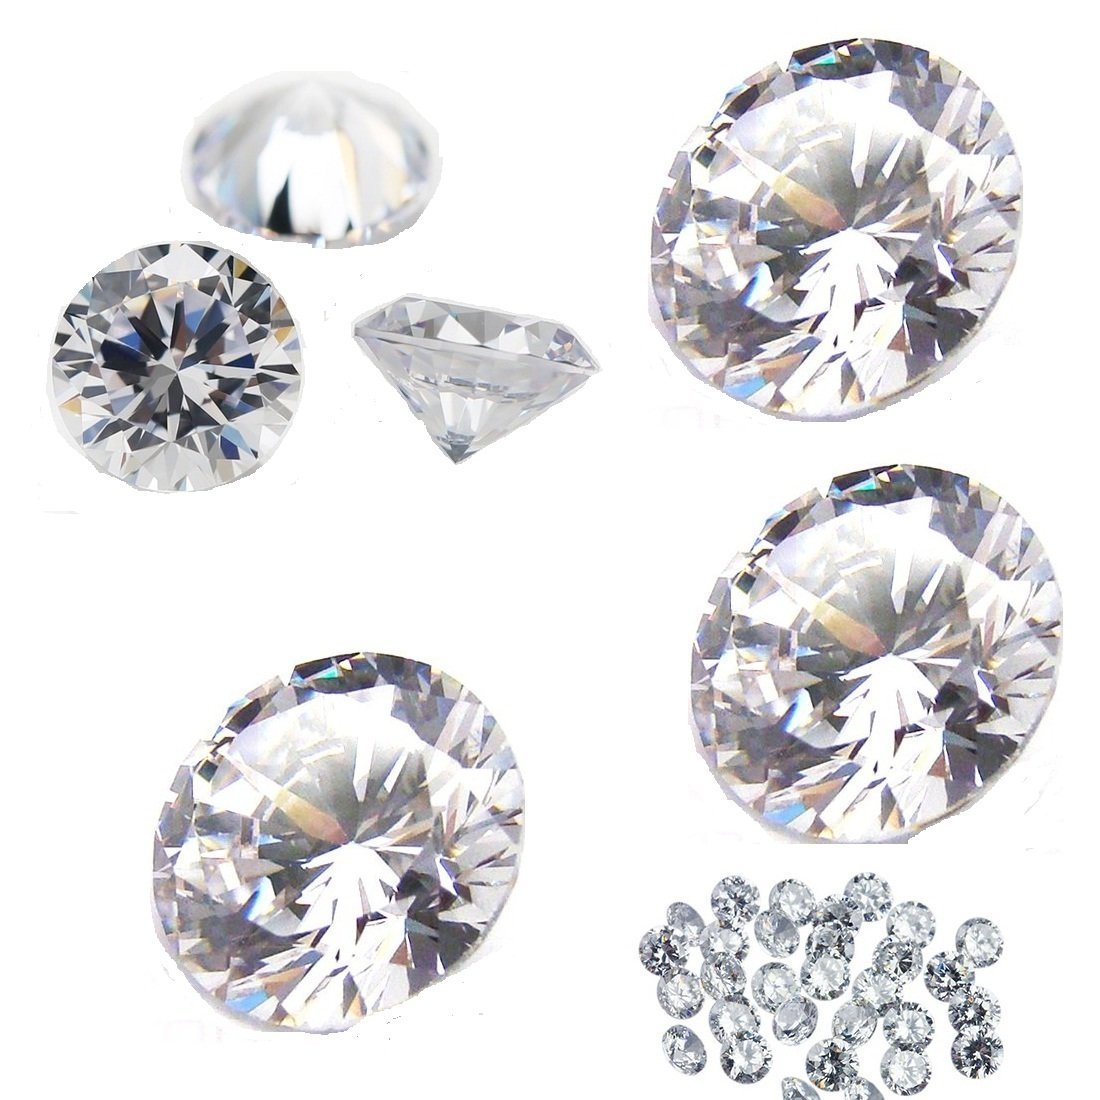 Mughal Gems & Jewellery White Cubic Zirconia AAA Quality Star Cut Round Shape Loose Gemstone MG-WCZ